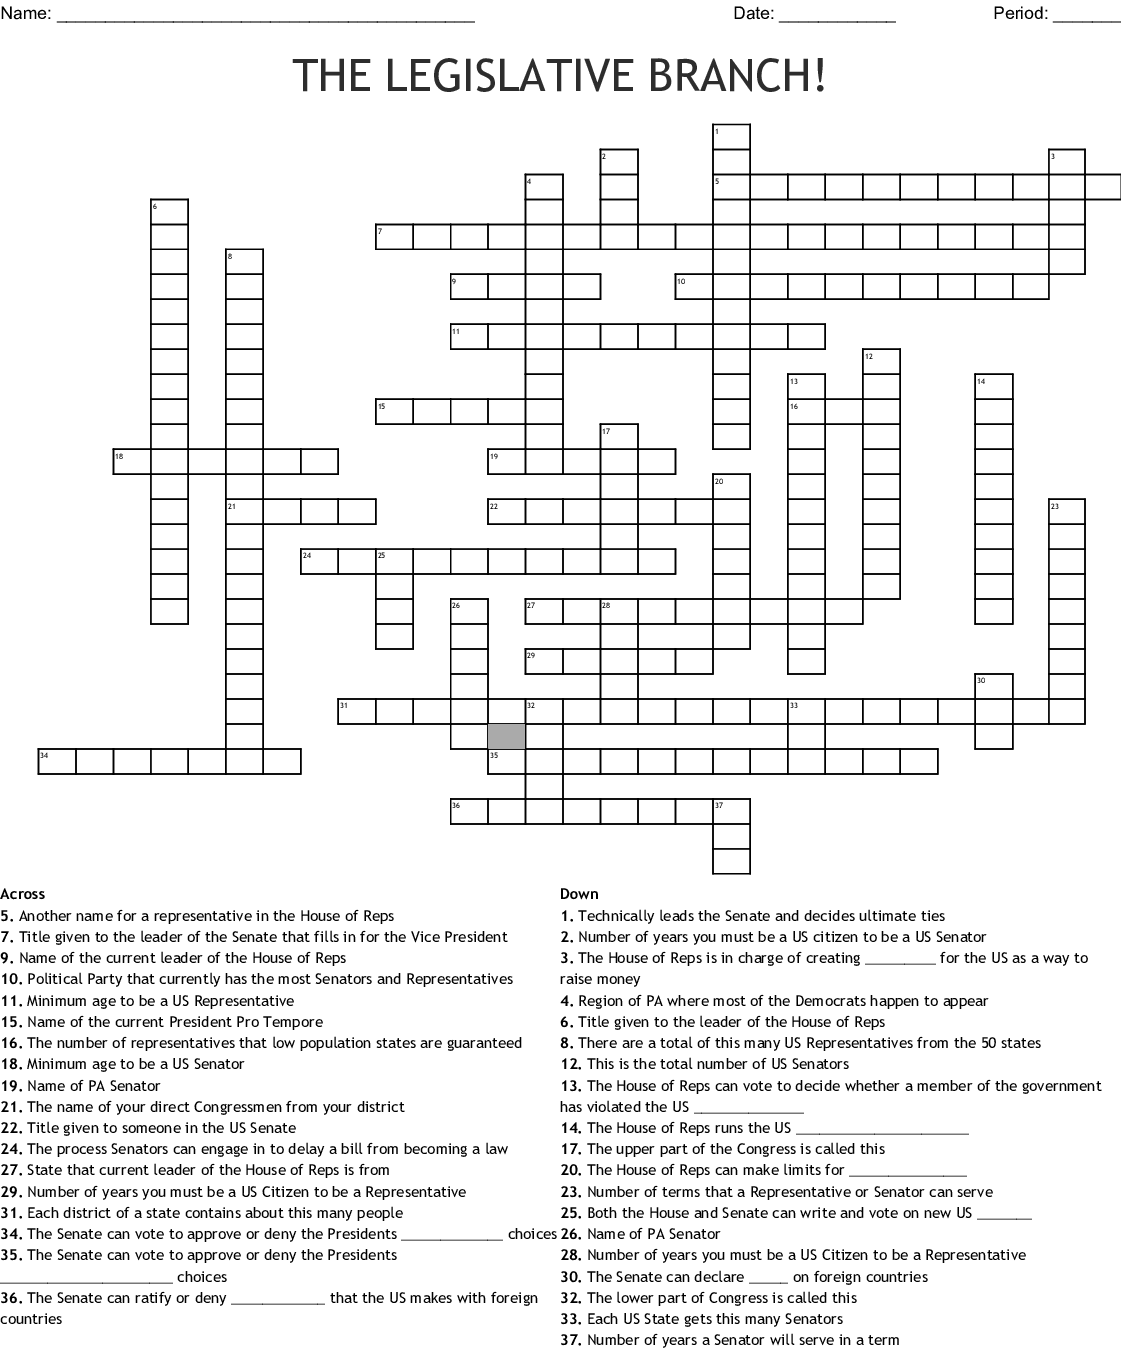 Chapter 6 The Legislative Branch Crossword